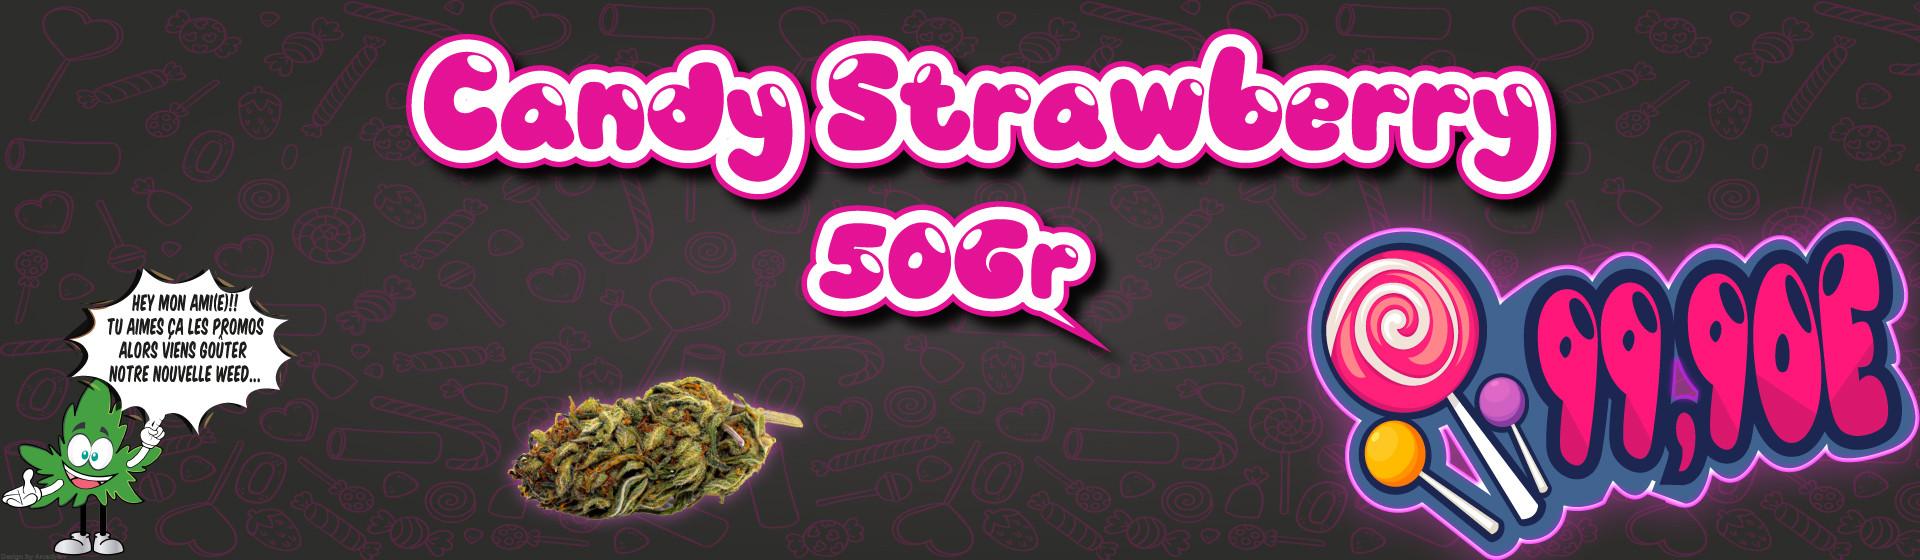 Candy strawberry